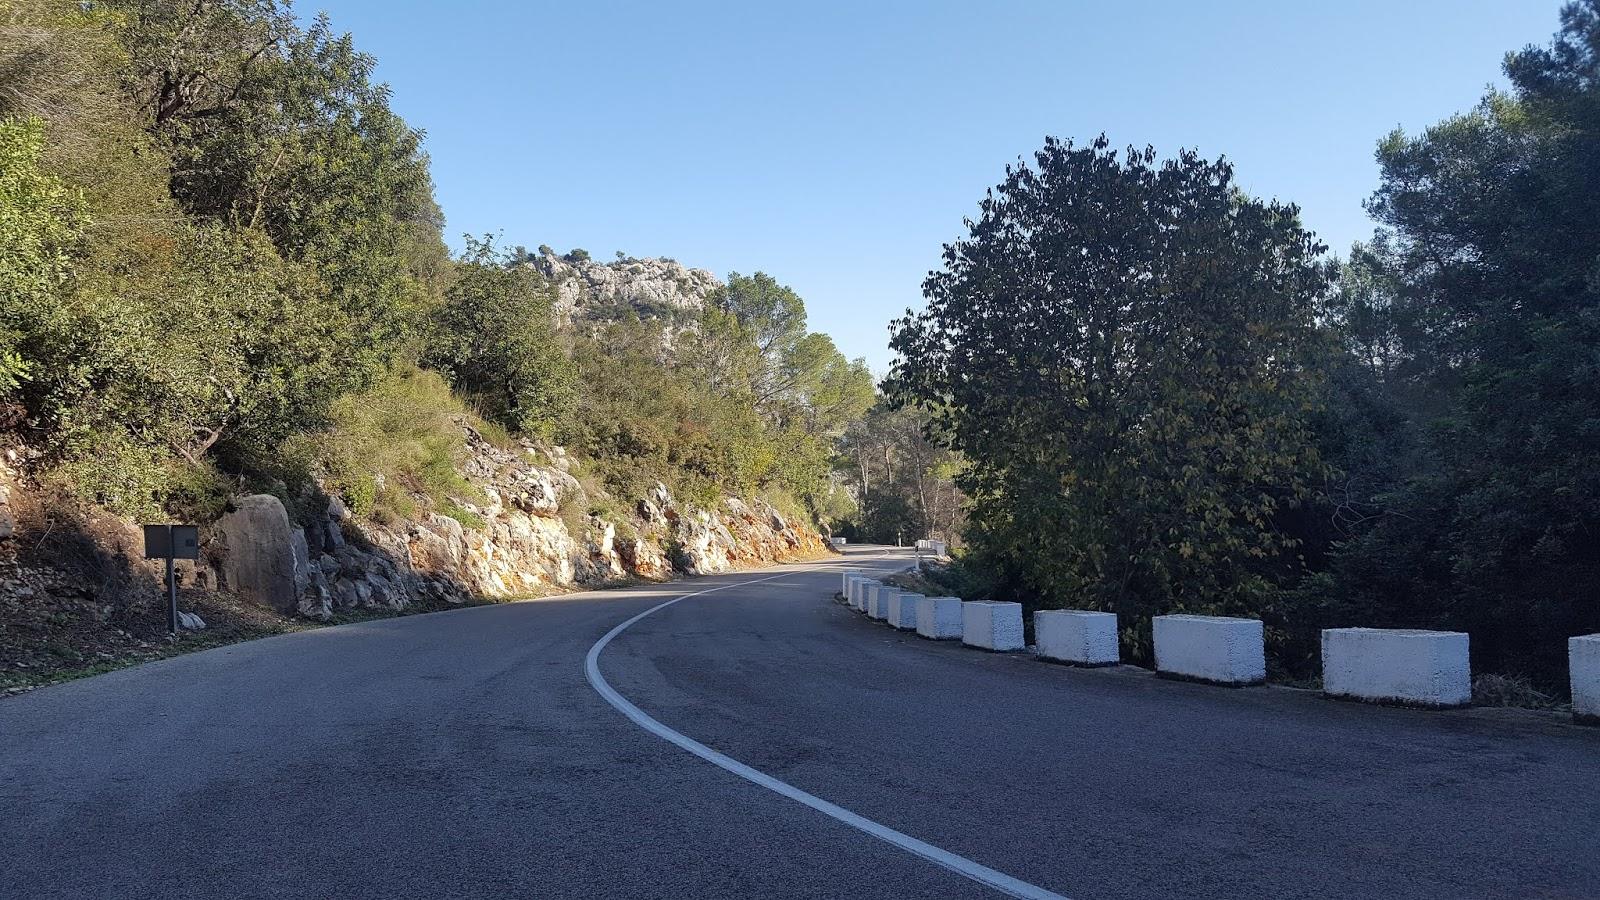 Steepest section of Vall de Ebo climb, Alicante